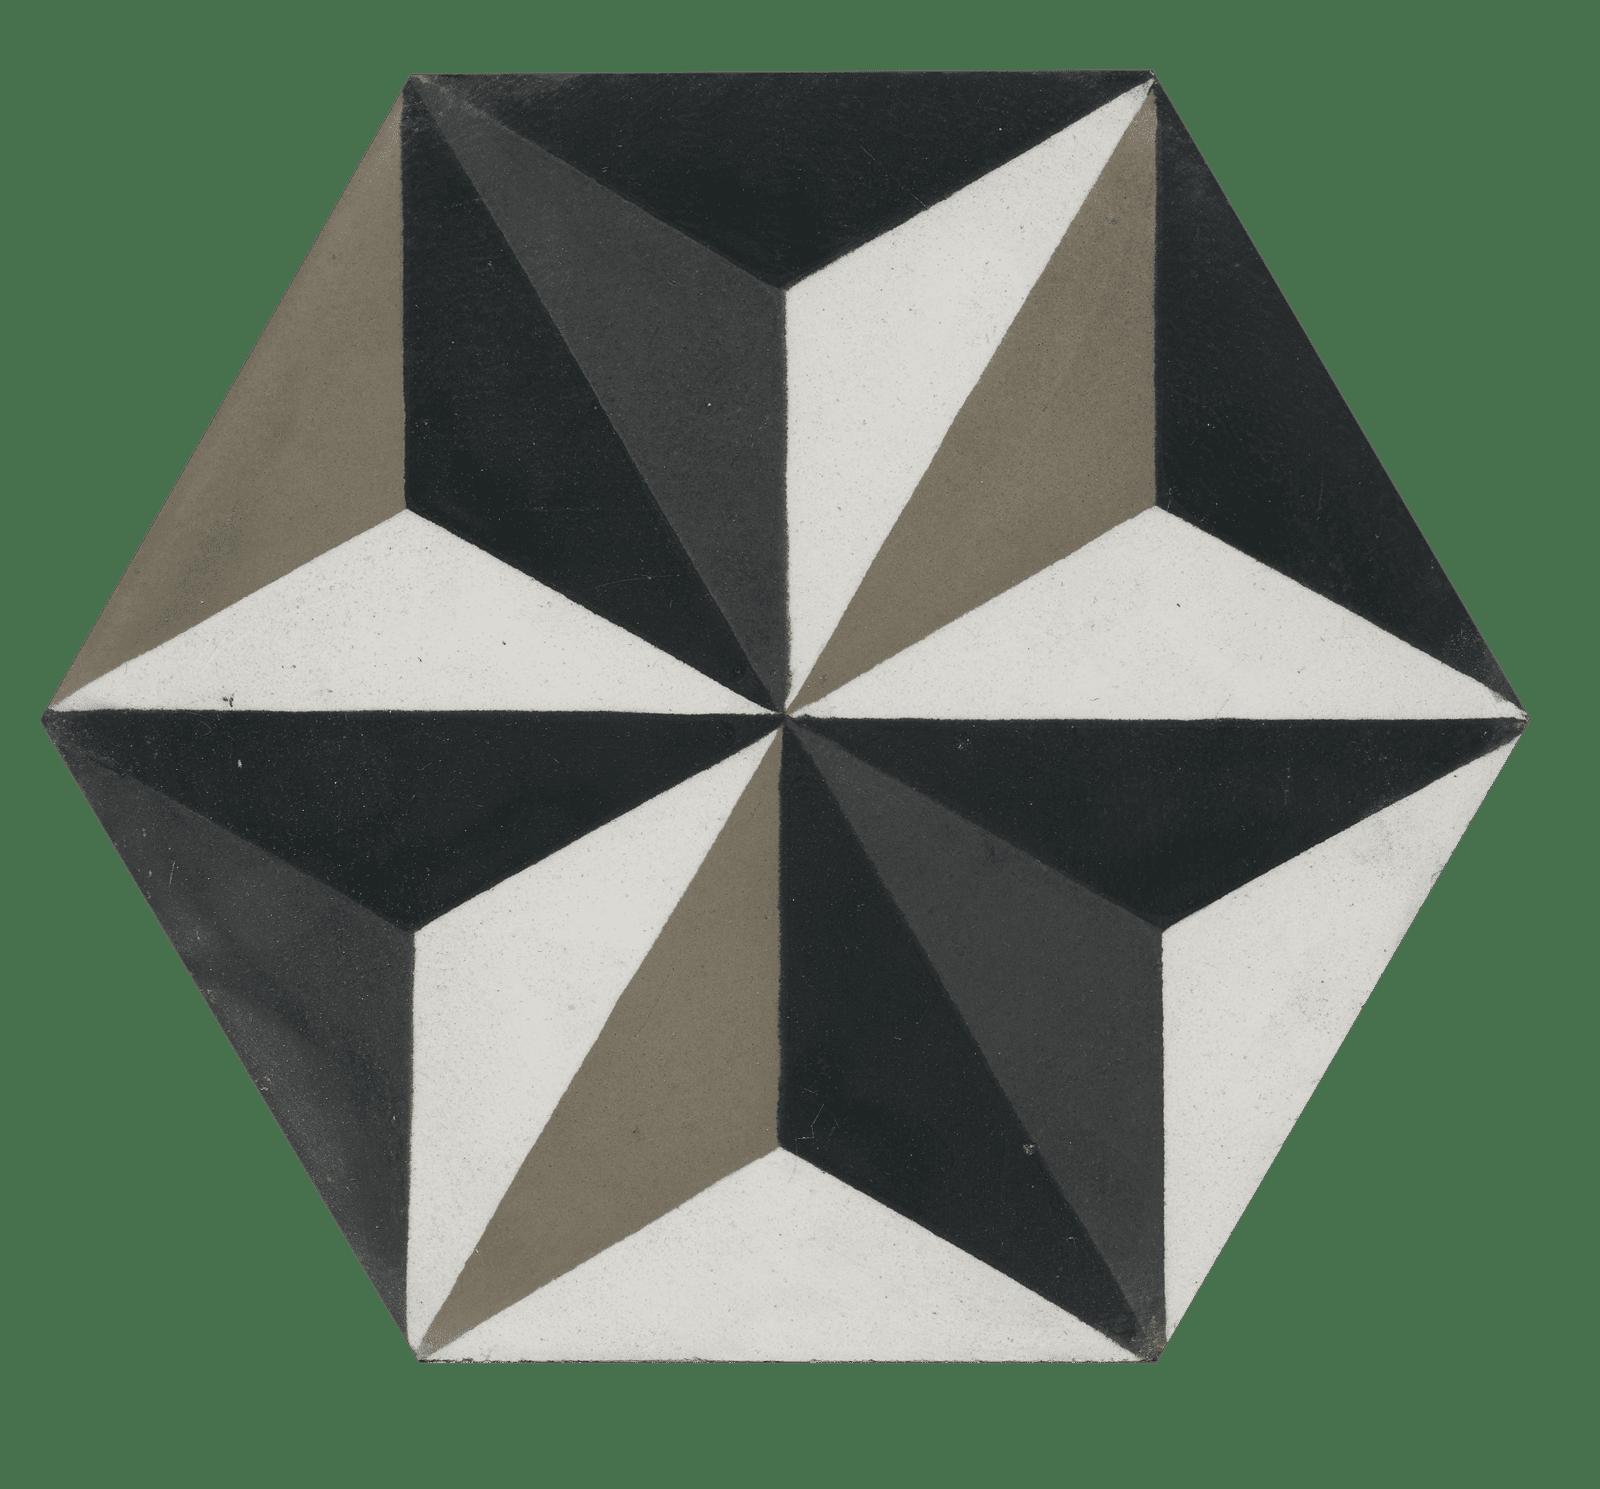 zementmosaikplatte-nummer-600760-via-gmbh | 600760